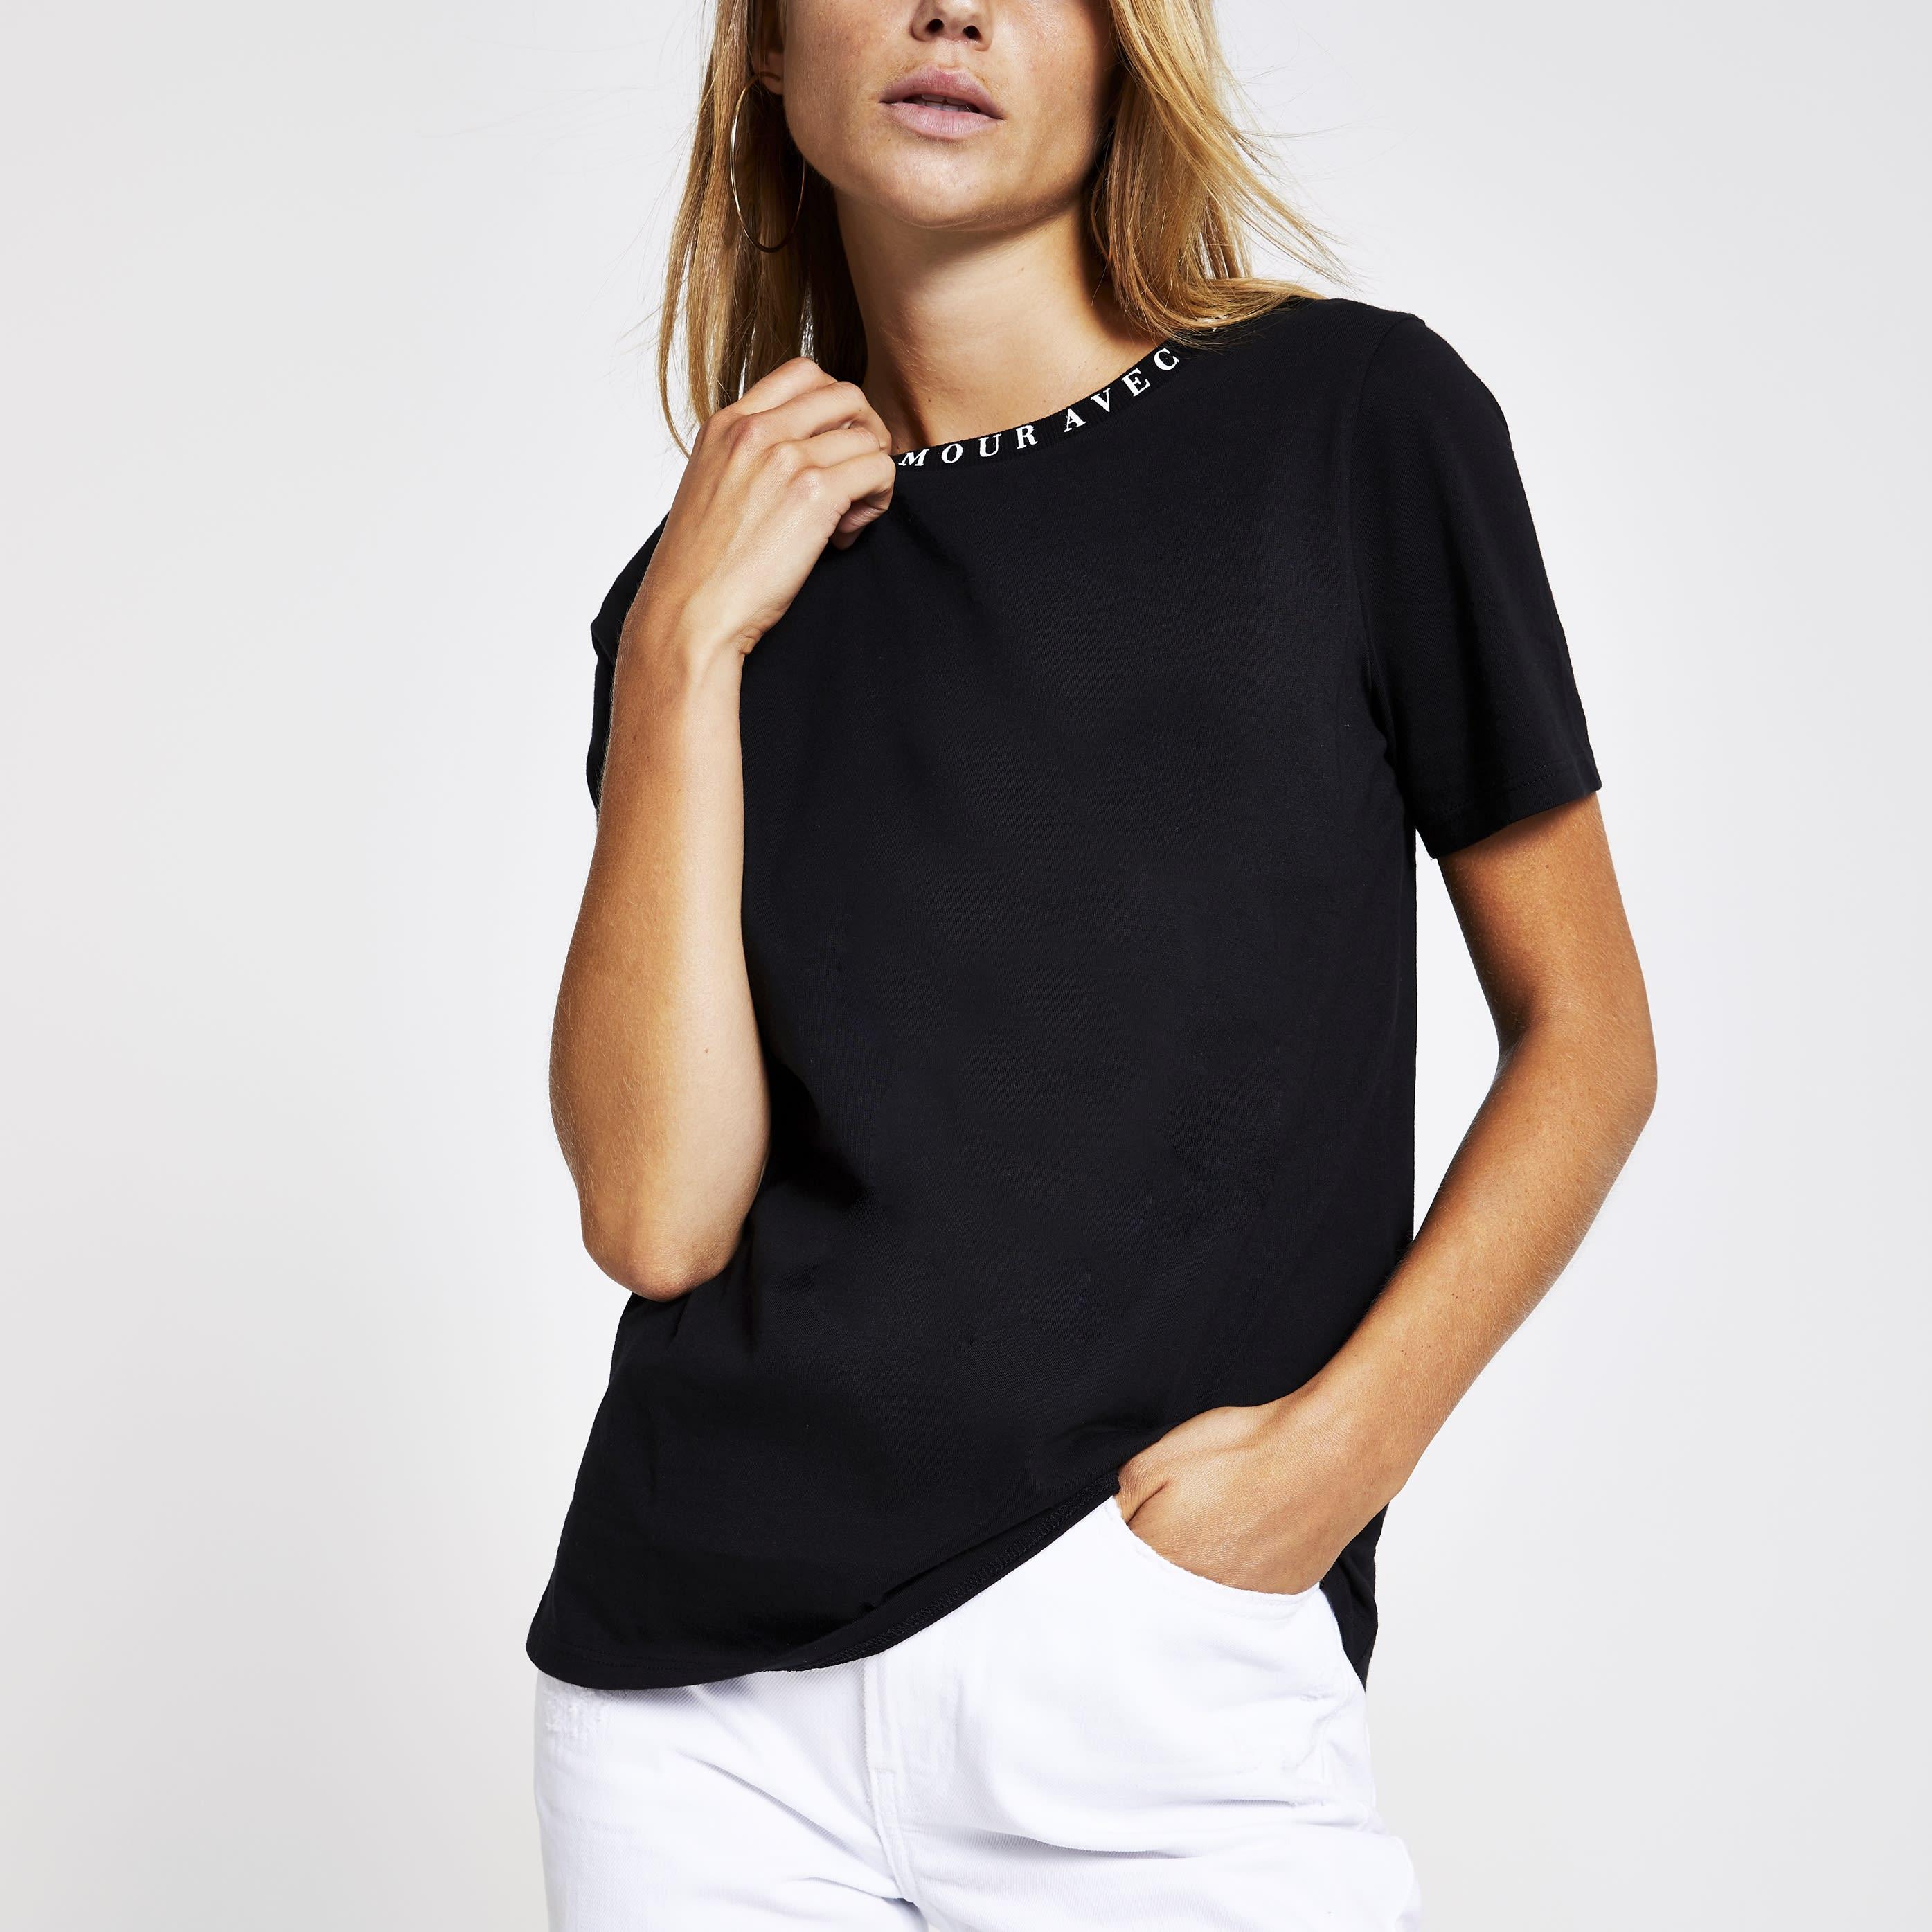 River Island Womens Black 'Mon amour' neck print T-shirt (8)